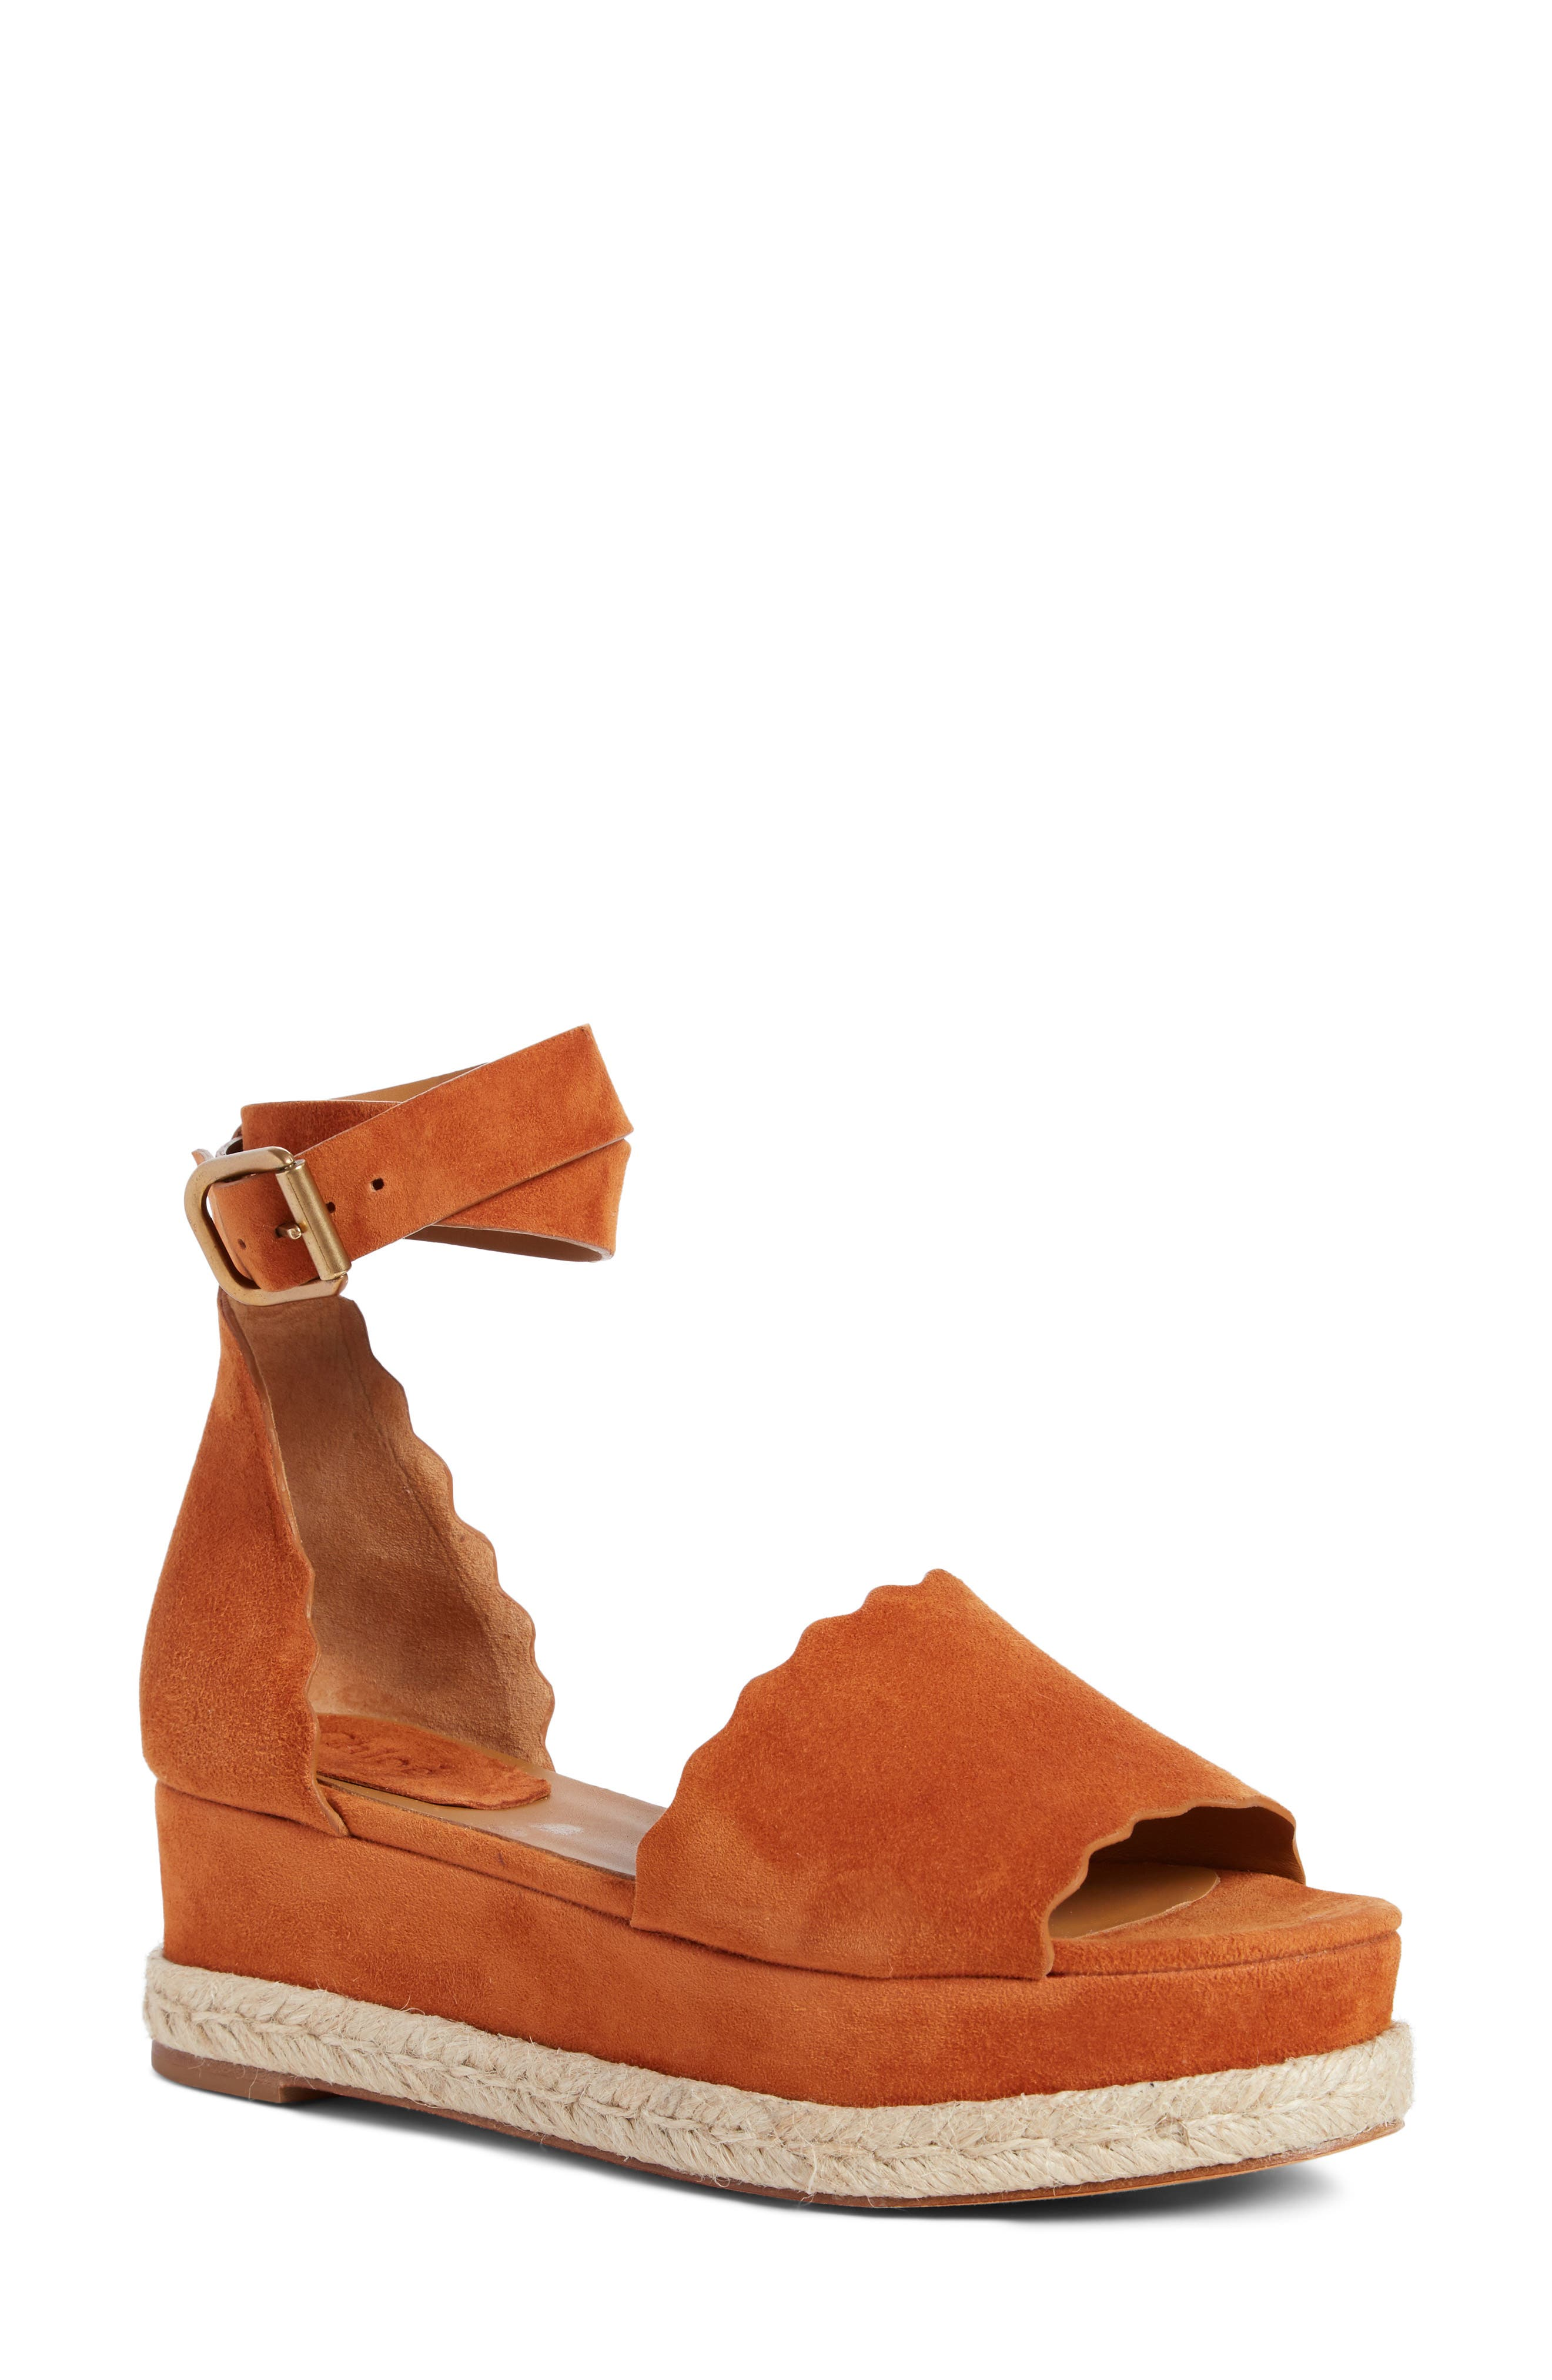 Lauren Espadrille Wedge Sandal,                         Main,                         color, 210